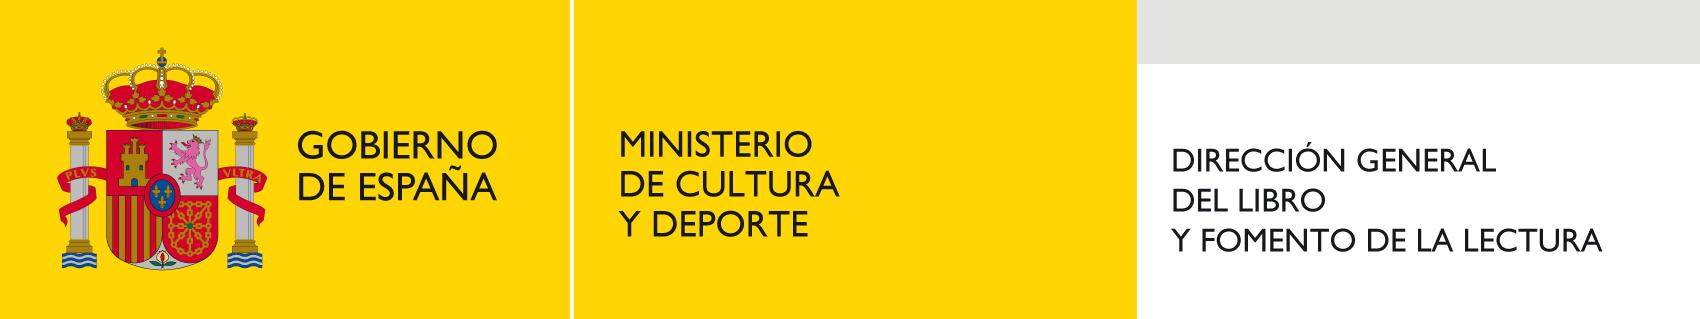 ministerio cultura deporte